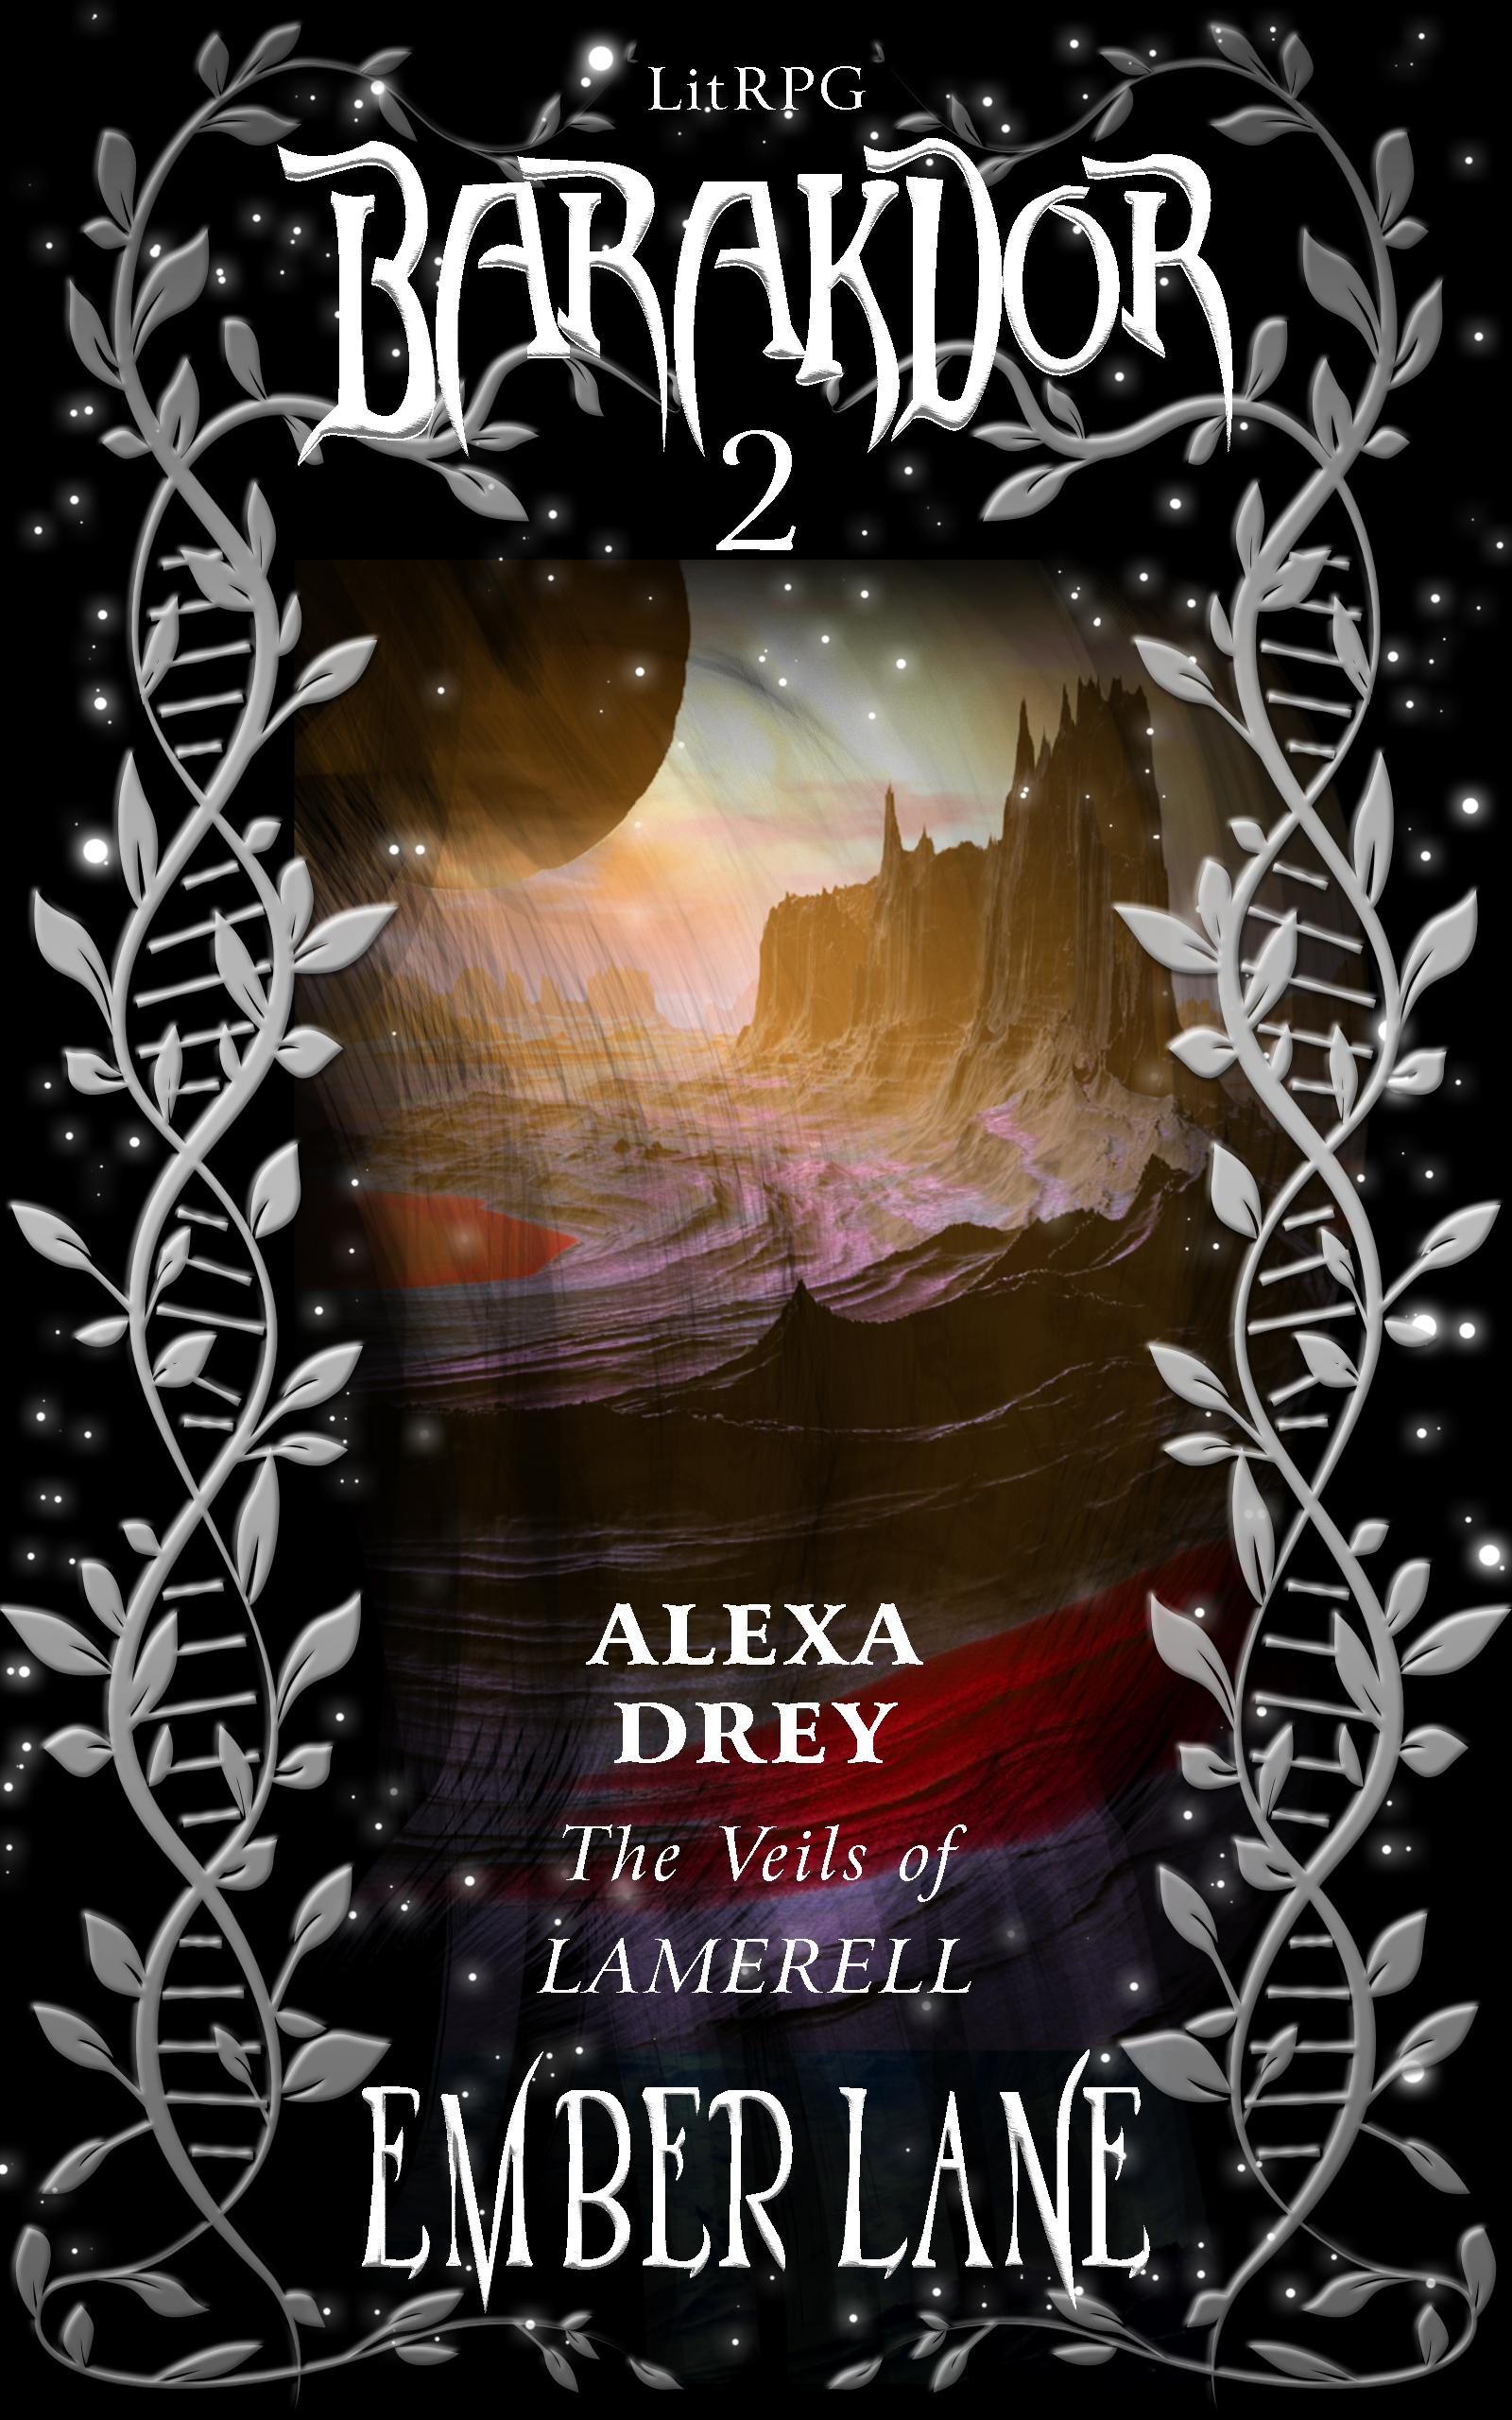 Alexa Drey – The Veils of Lamerell